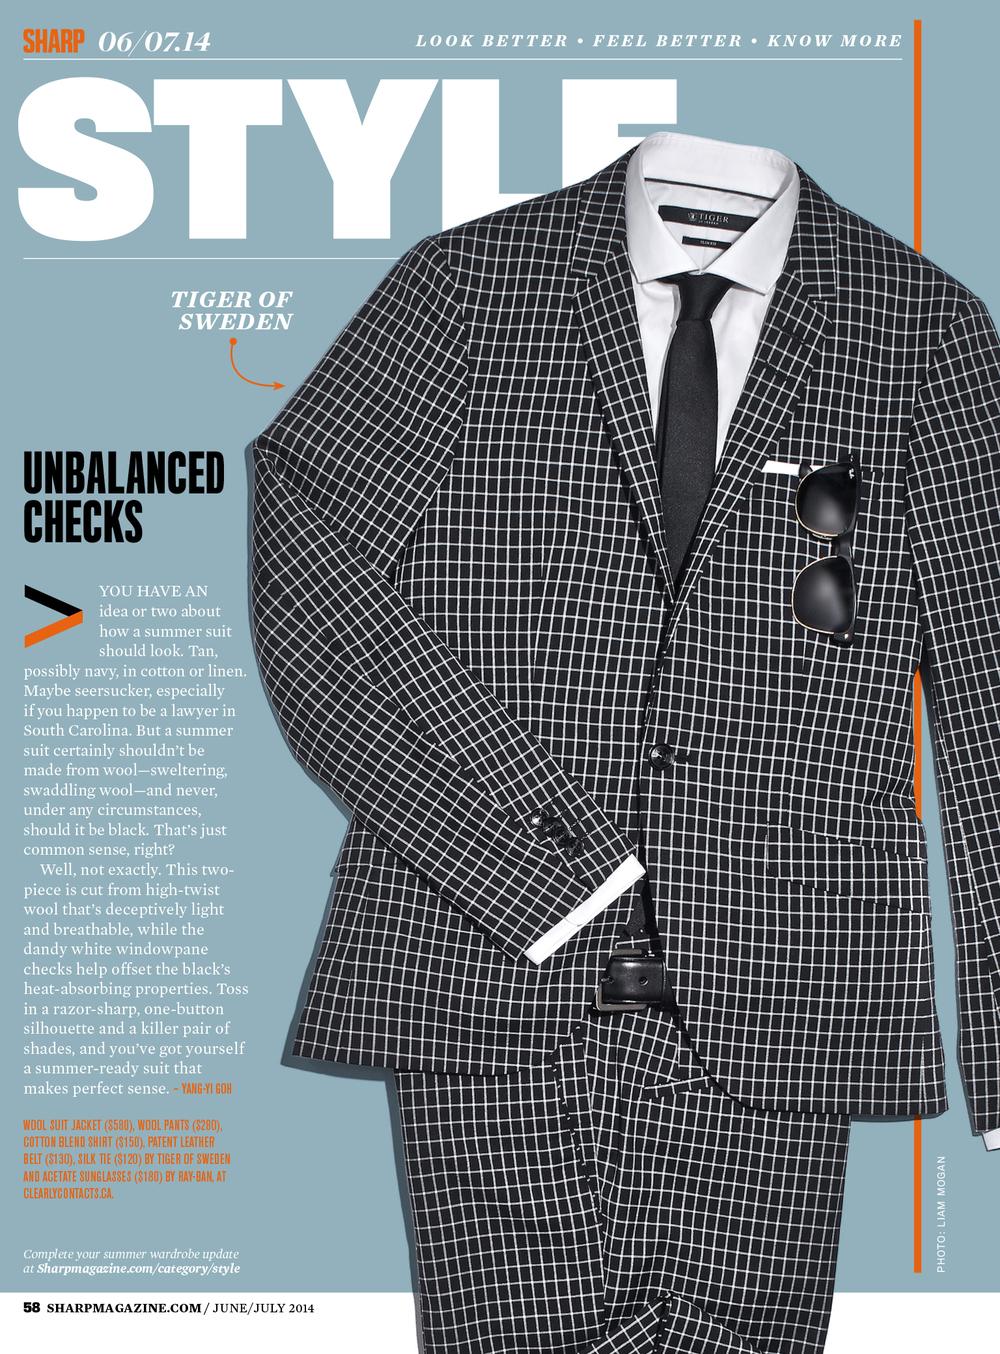 Sharp Magazine / Summer 2014 Tiger of Sweden